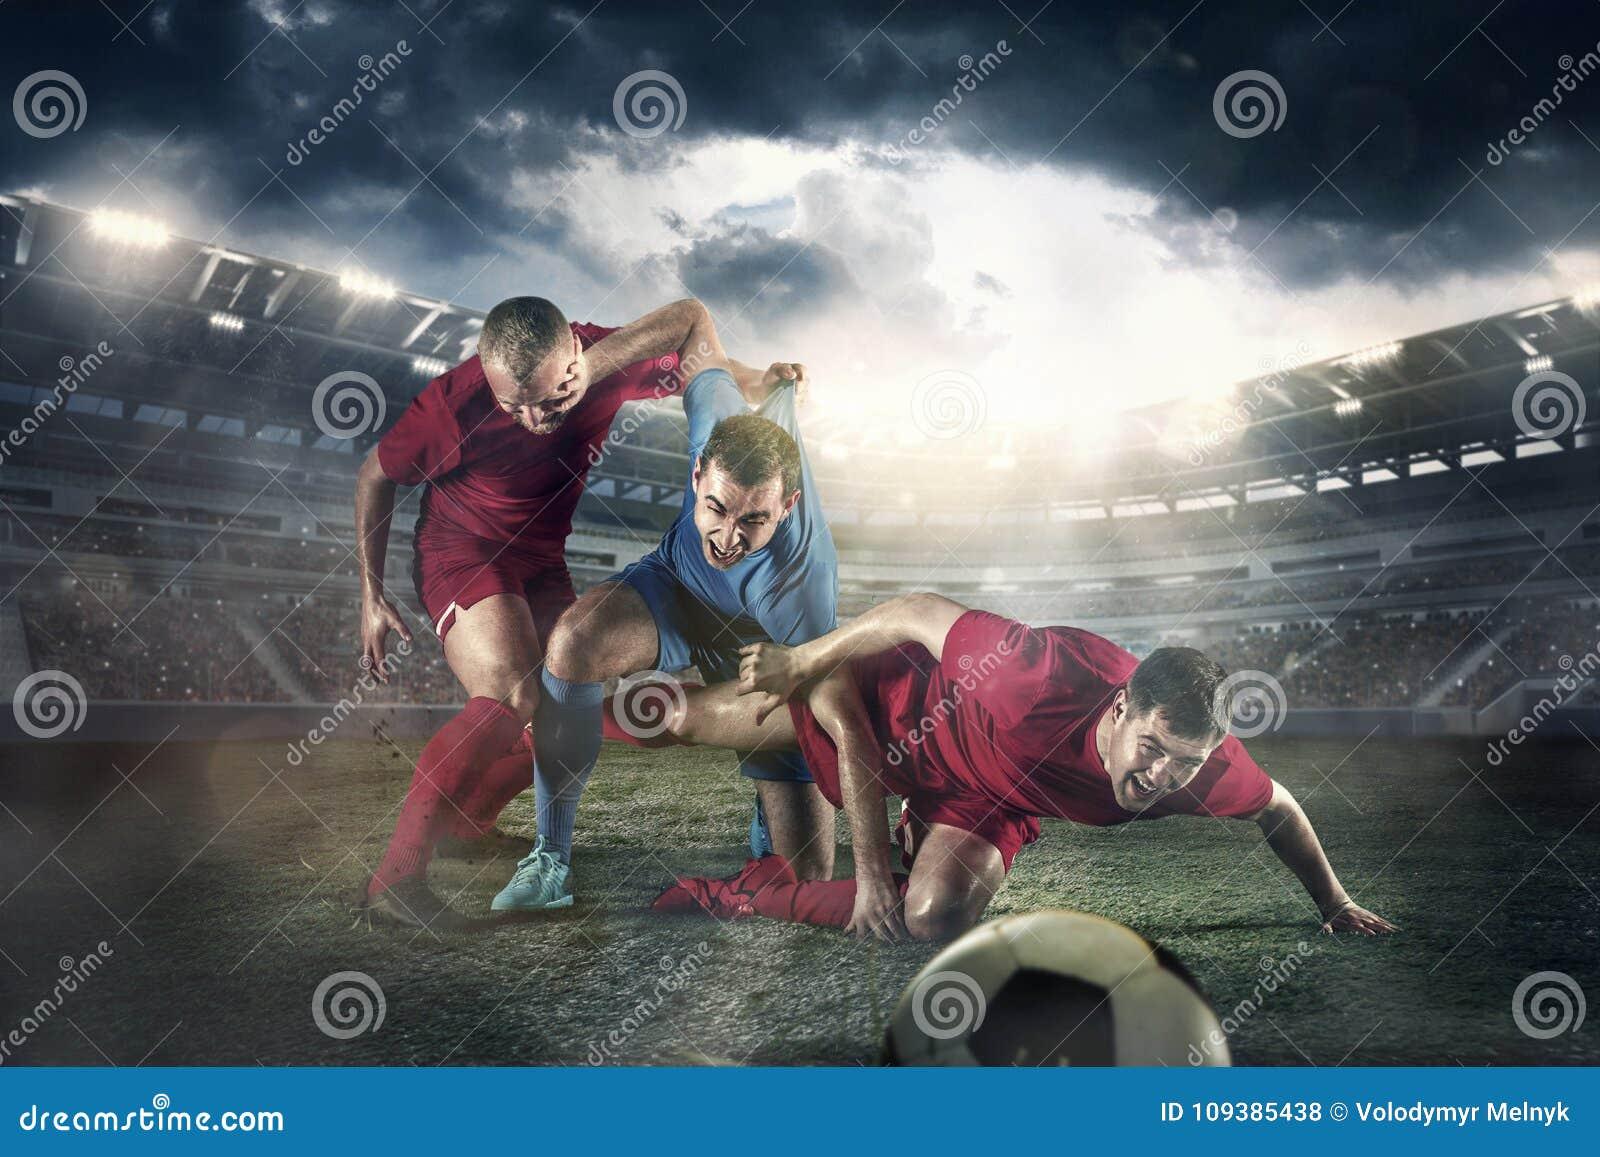 Футболист в движении на поле стадиона